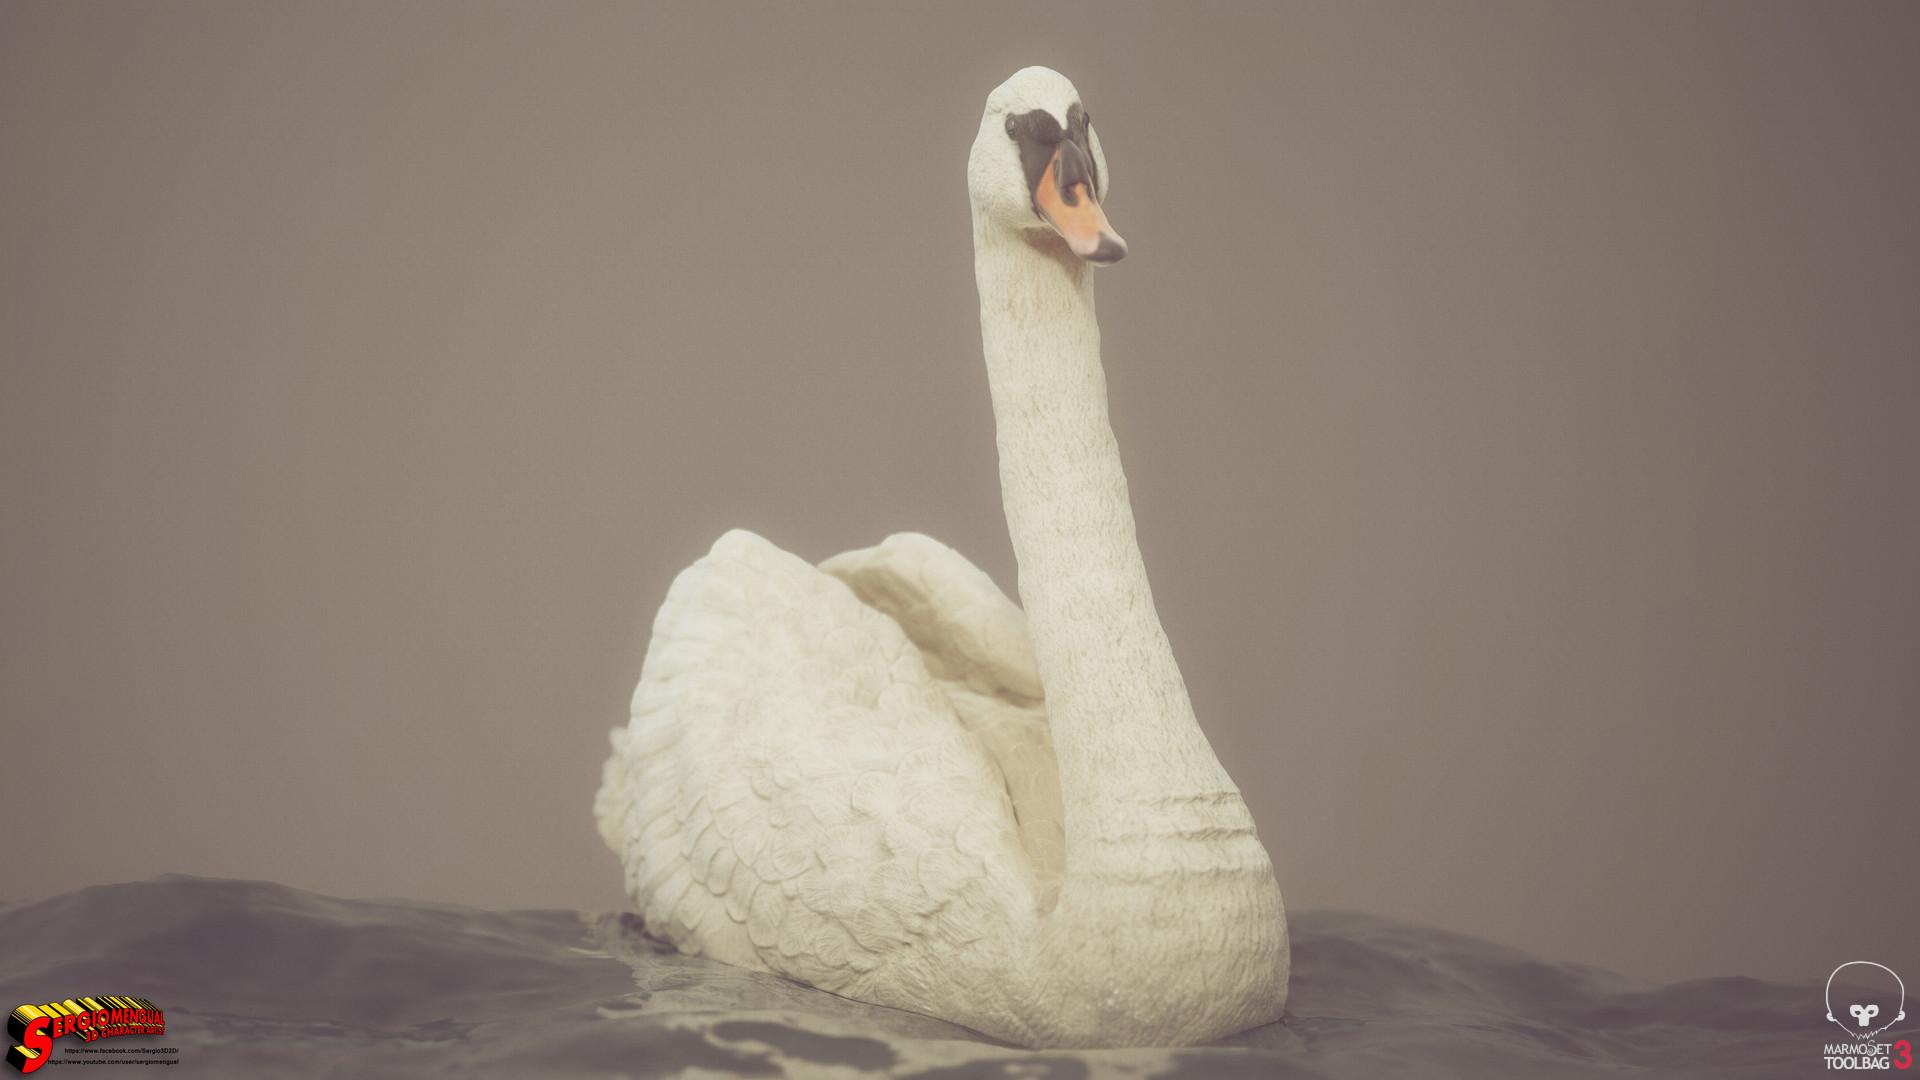 Sergio gabriel mengual swan horizontal 5